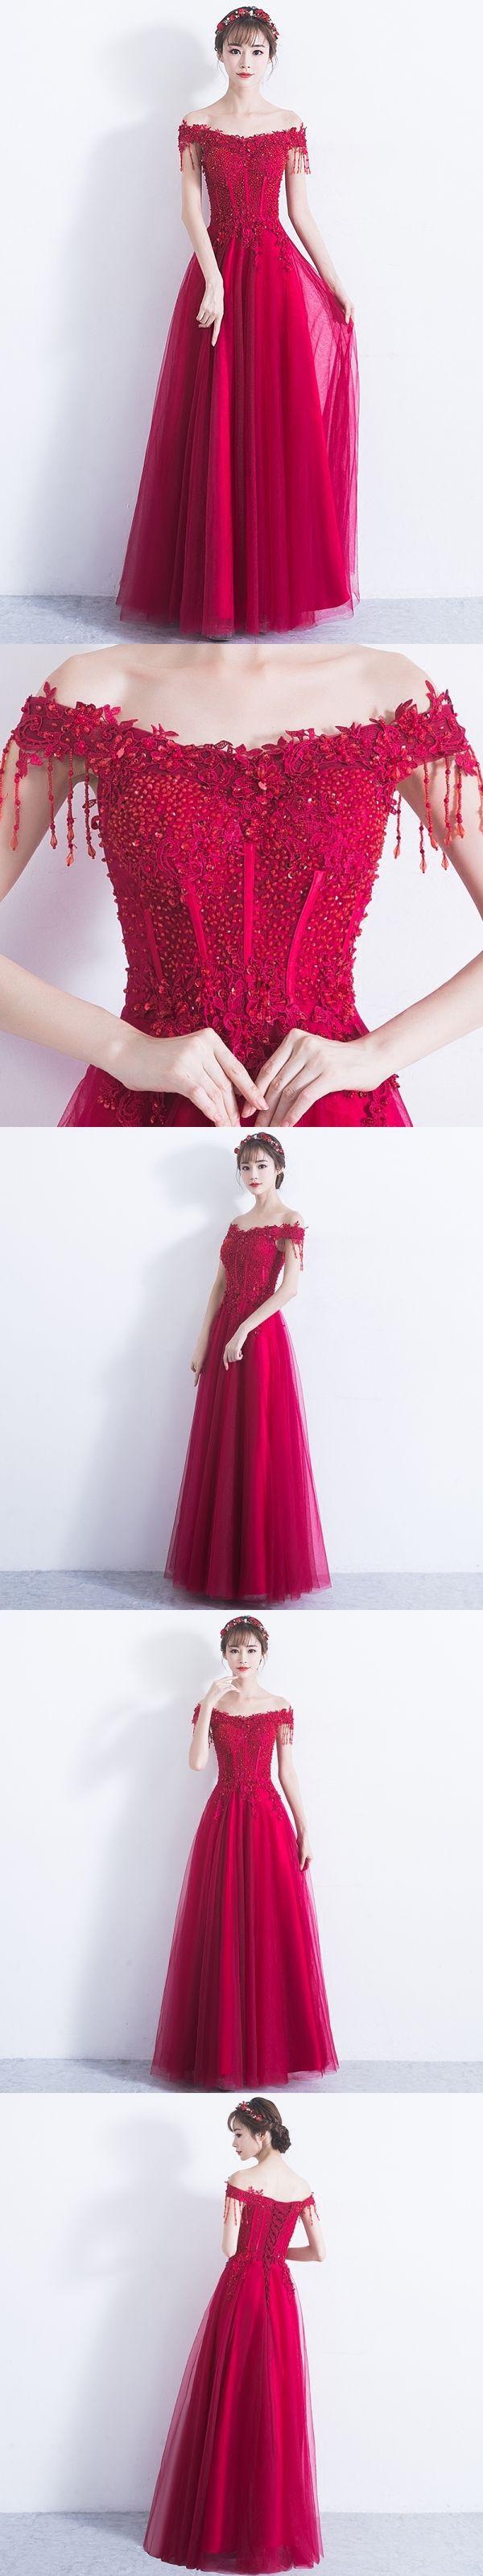 Sexy prom dresses offtheshoulder aline floorlength sparkly long